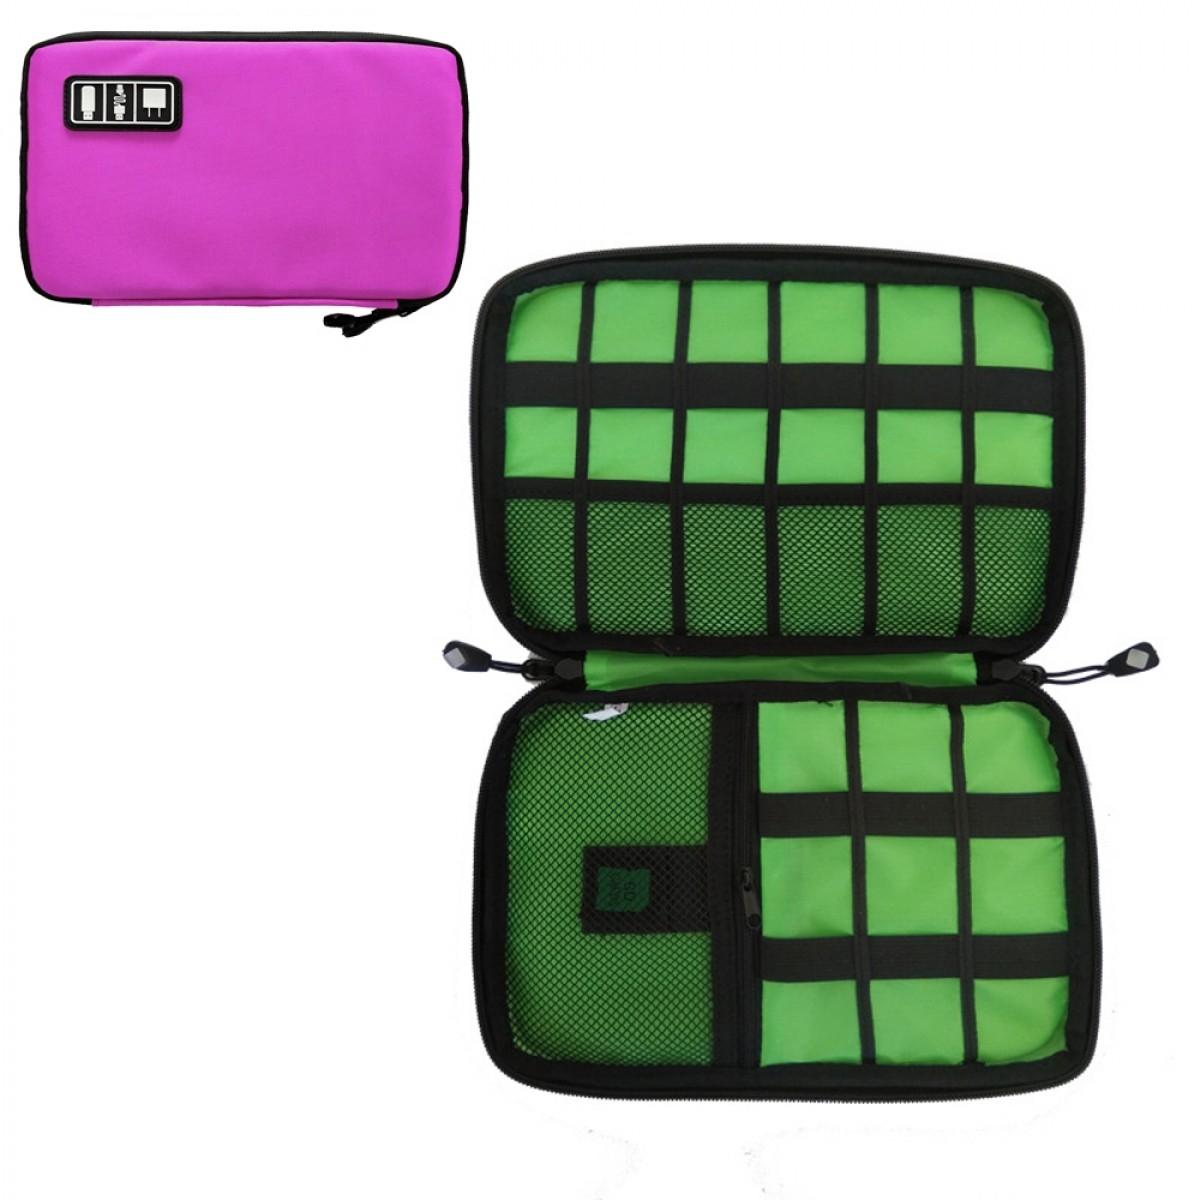 Electronic Organizer Small Travel Bag - GARDGET